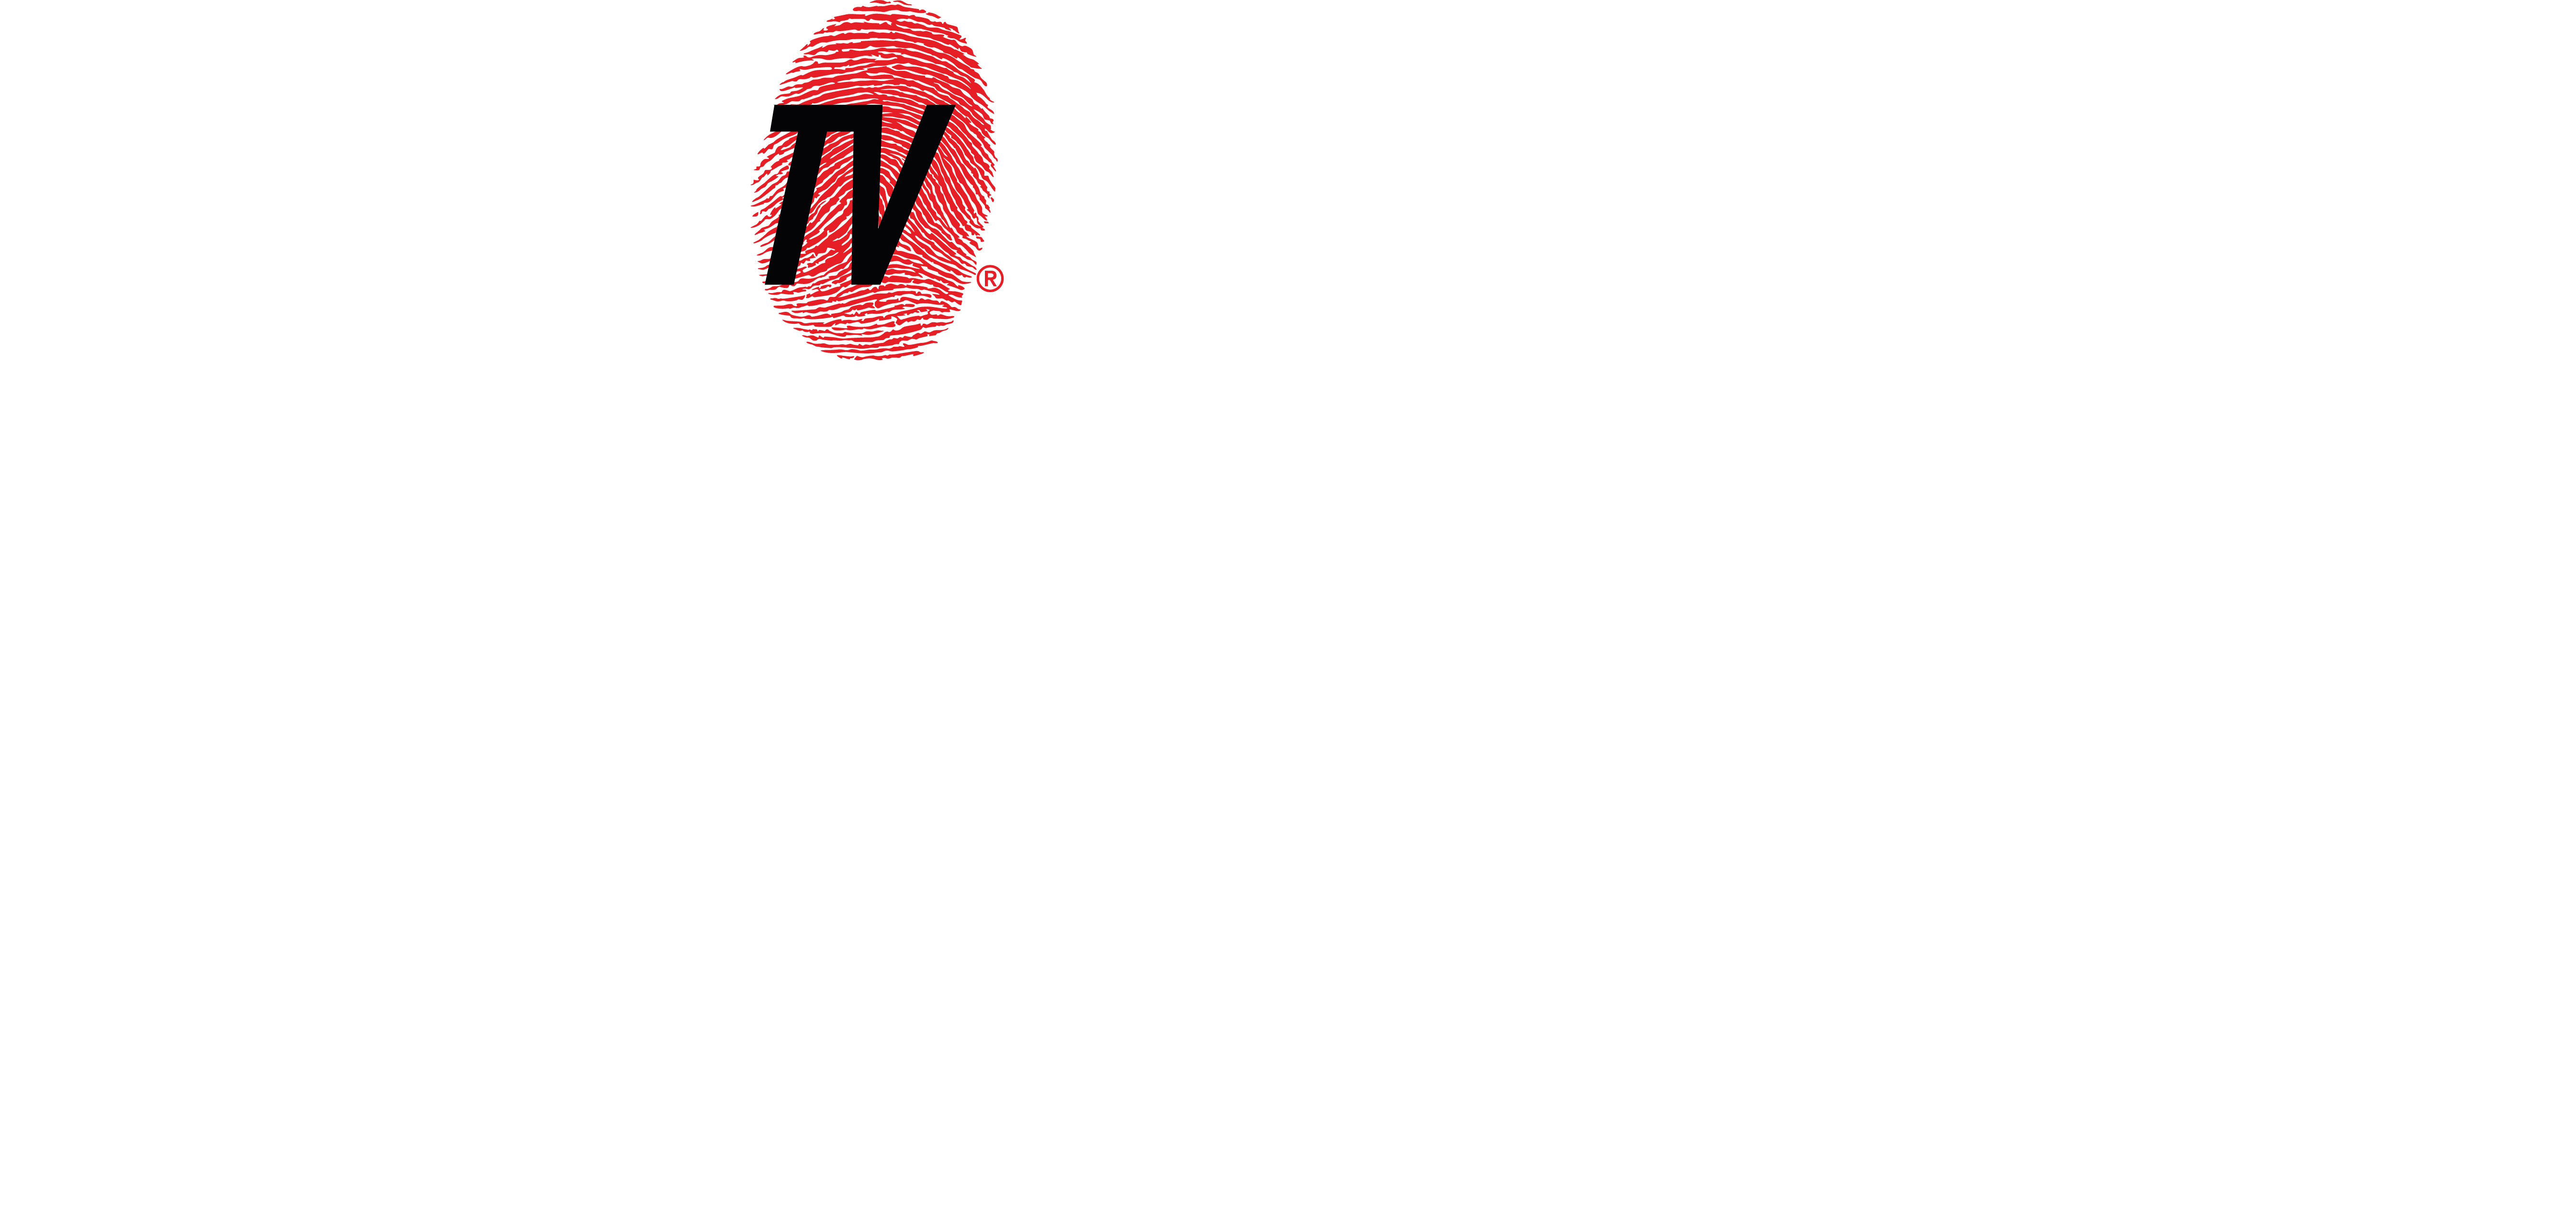 Court Tv Mystery Court Tv